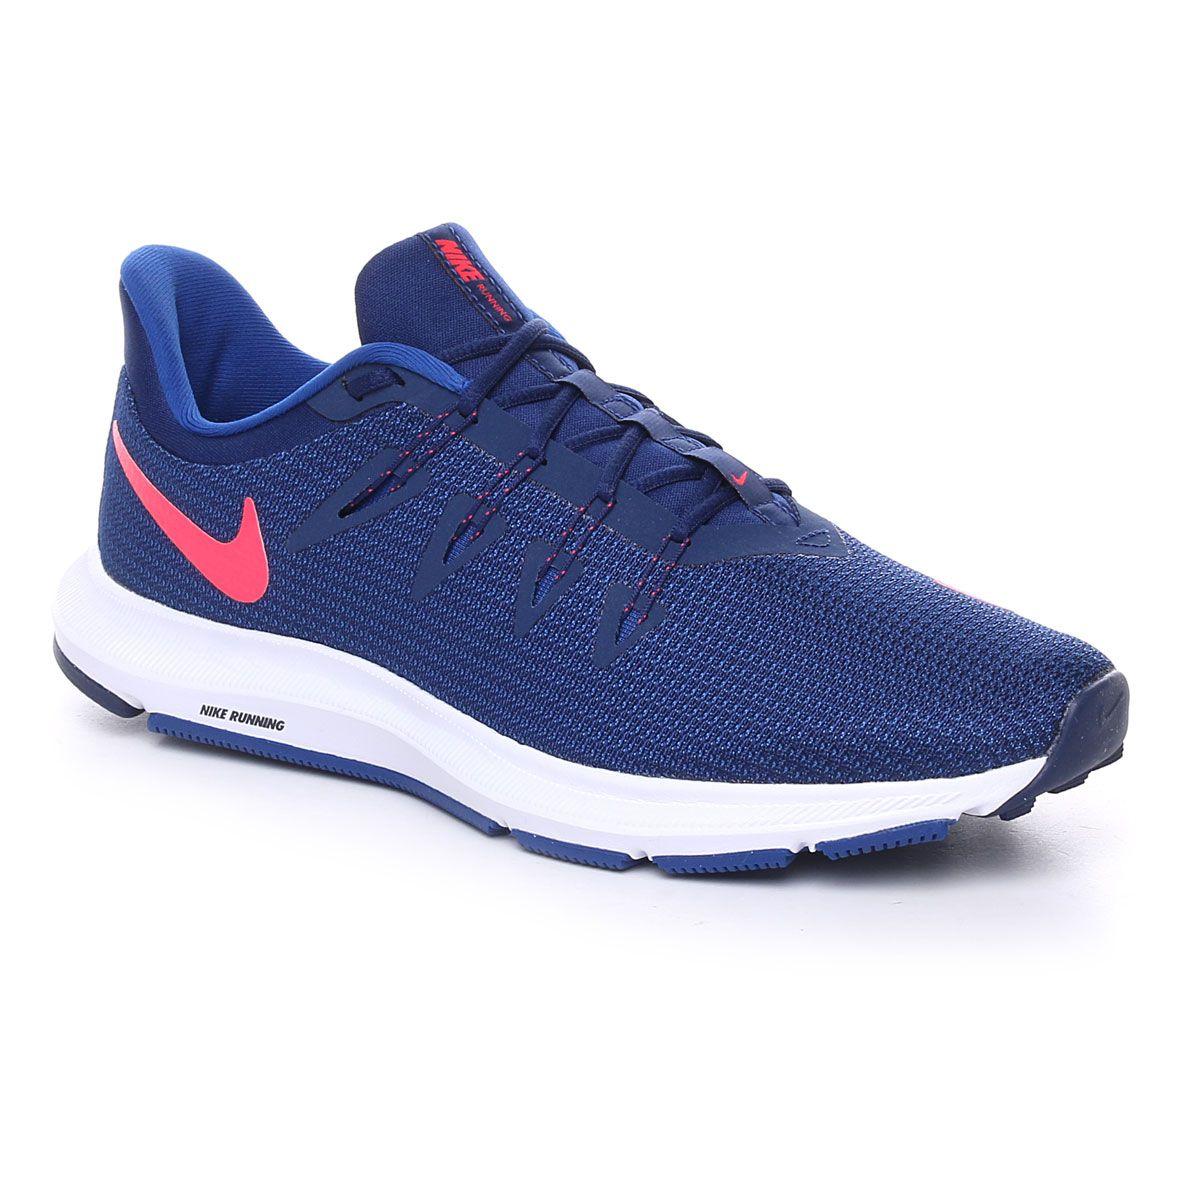 Nike Quest Blue Void Red Orbit